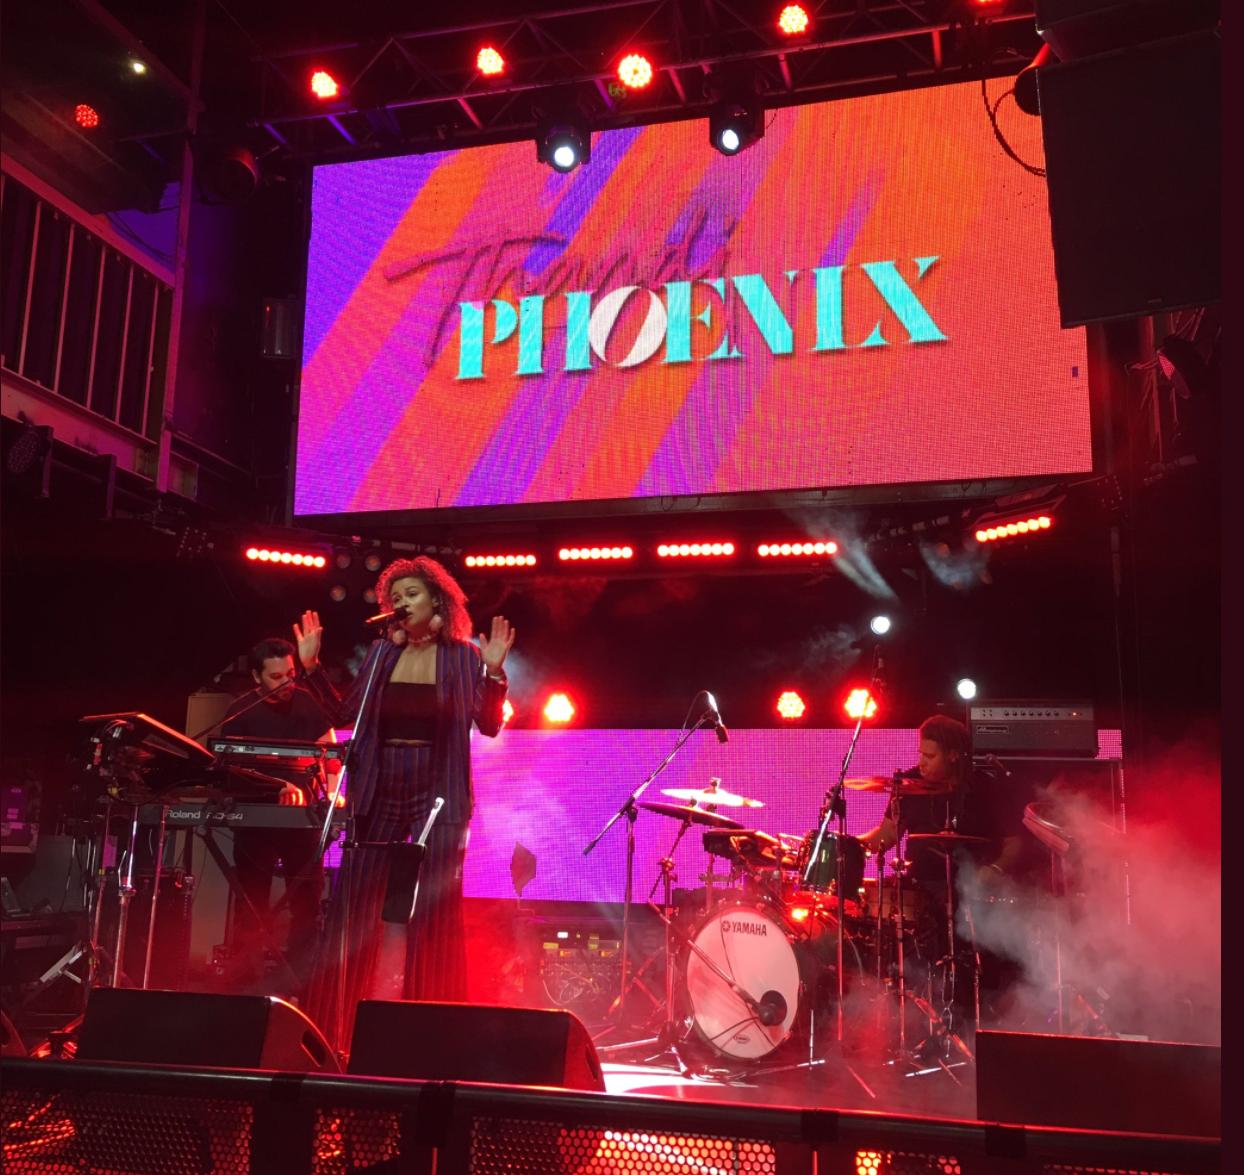 Thandi Phoenix performs at Bigsound 2017. Image via Bridget Hustwaite.